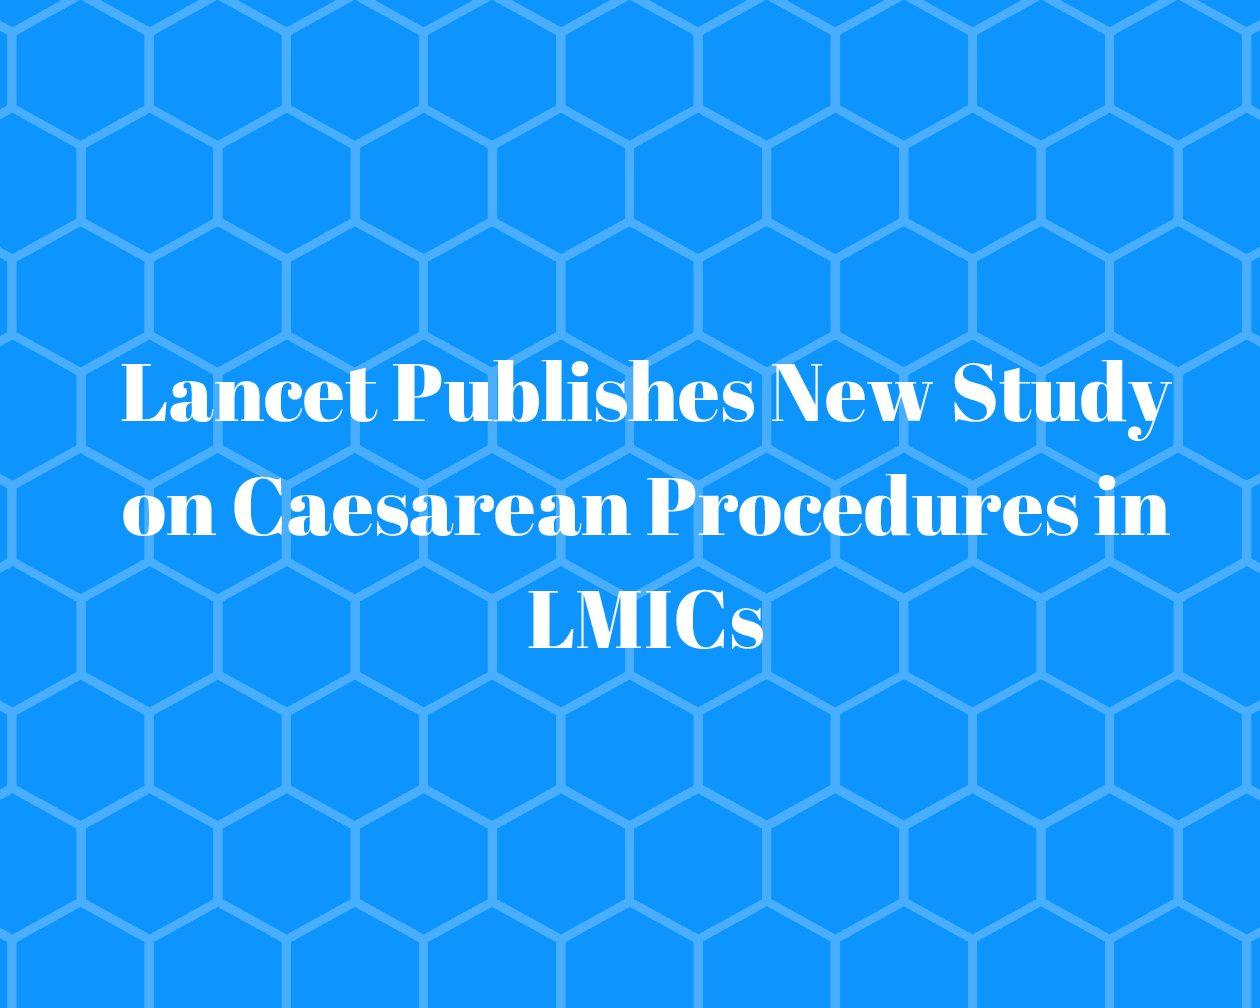 Lancet Publishes New Study on Caesarean Procedures in LMICs